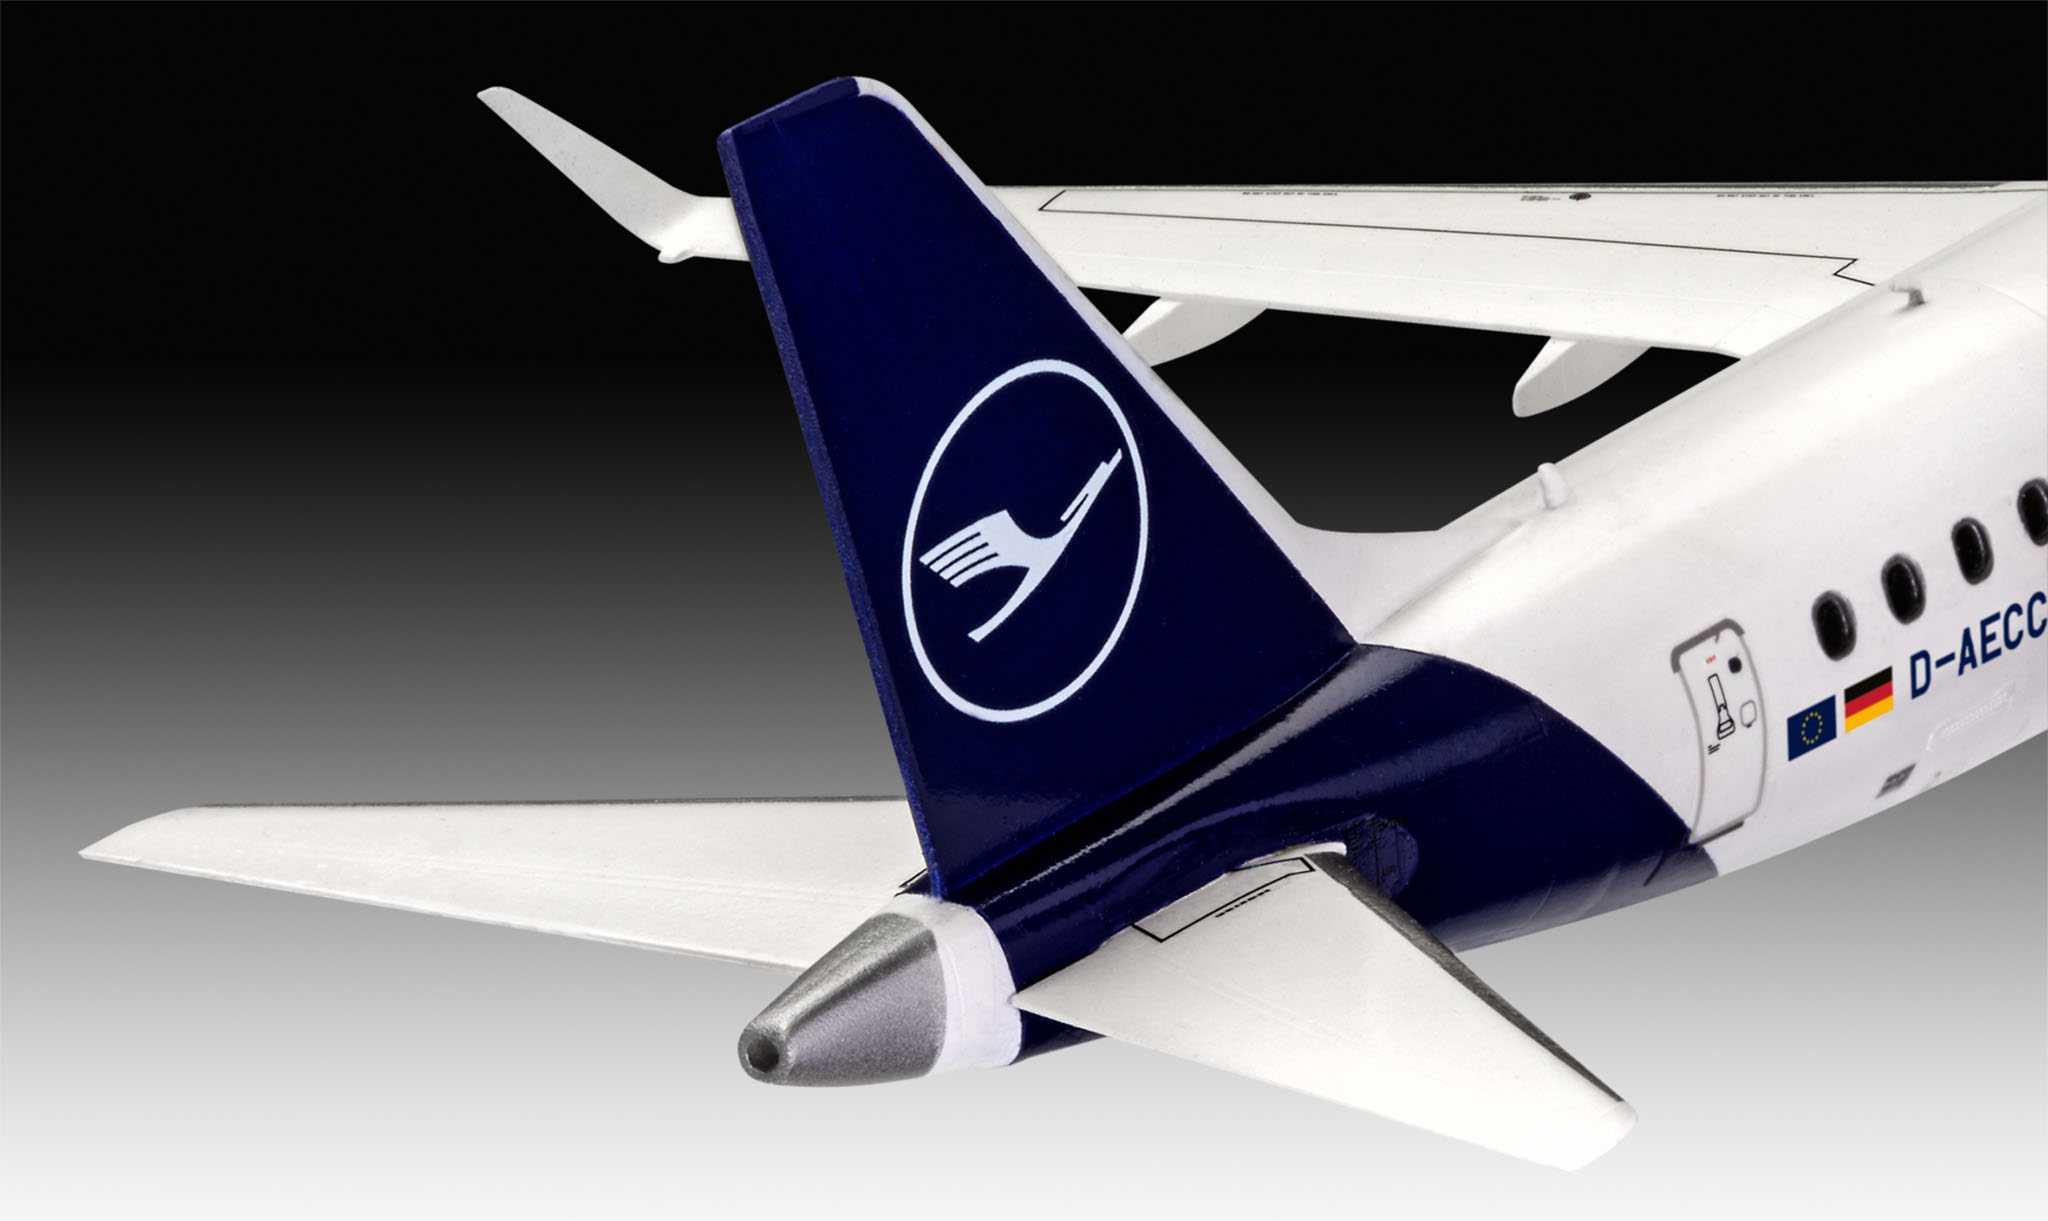 1:144 Embraer 190, Lufthansa New Livery